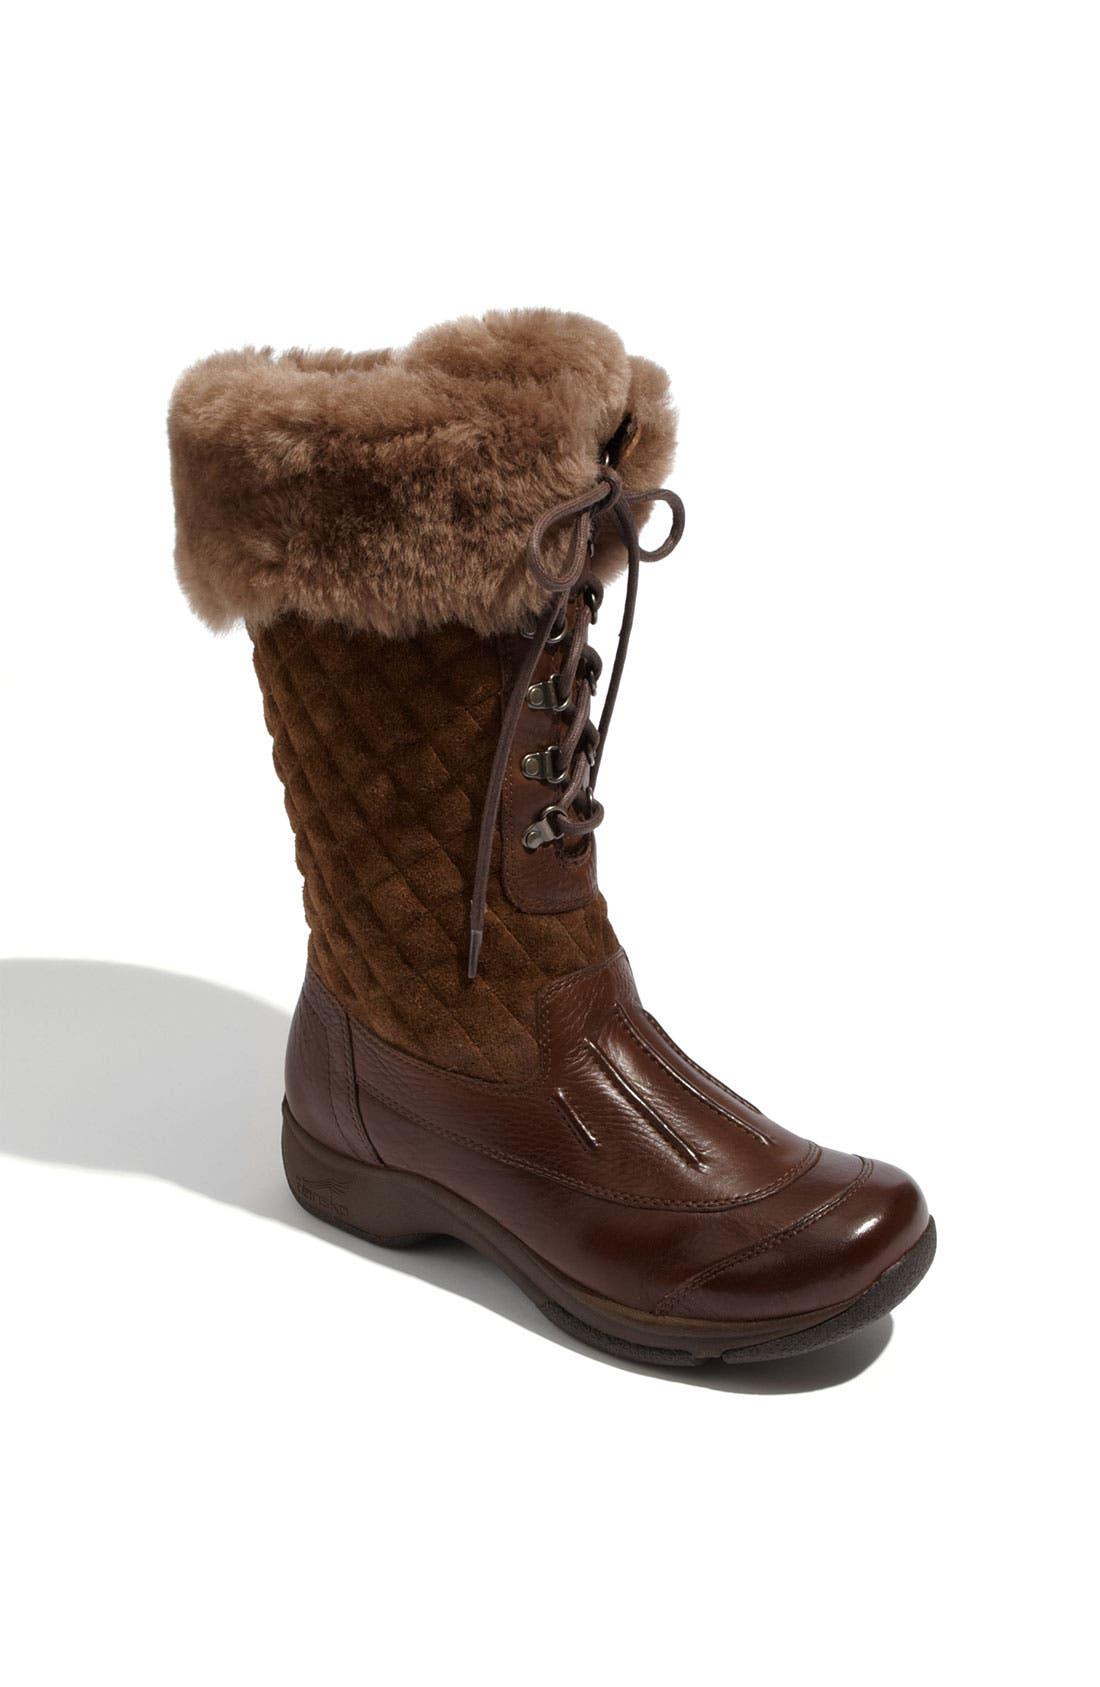 Alternate Image 1 Selected - Dansko 'Kassidy' Boot